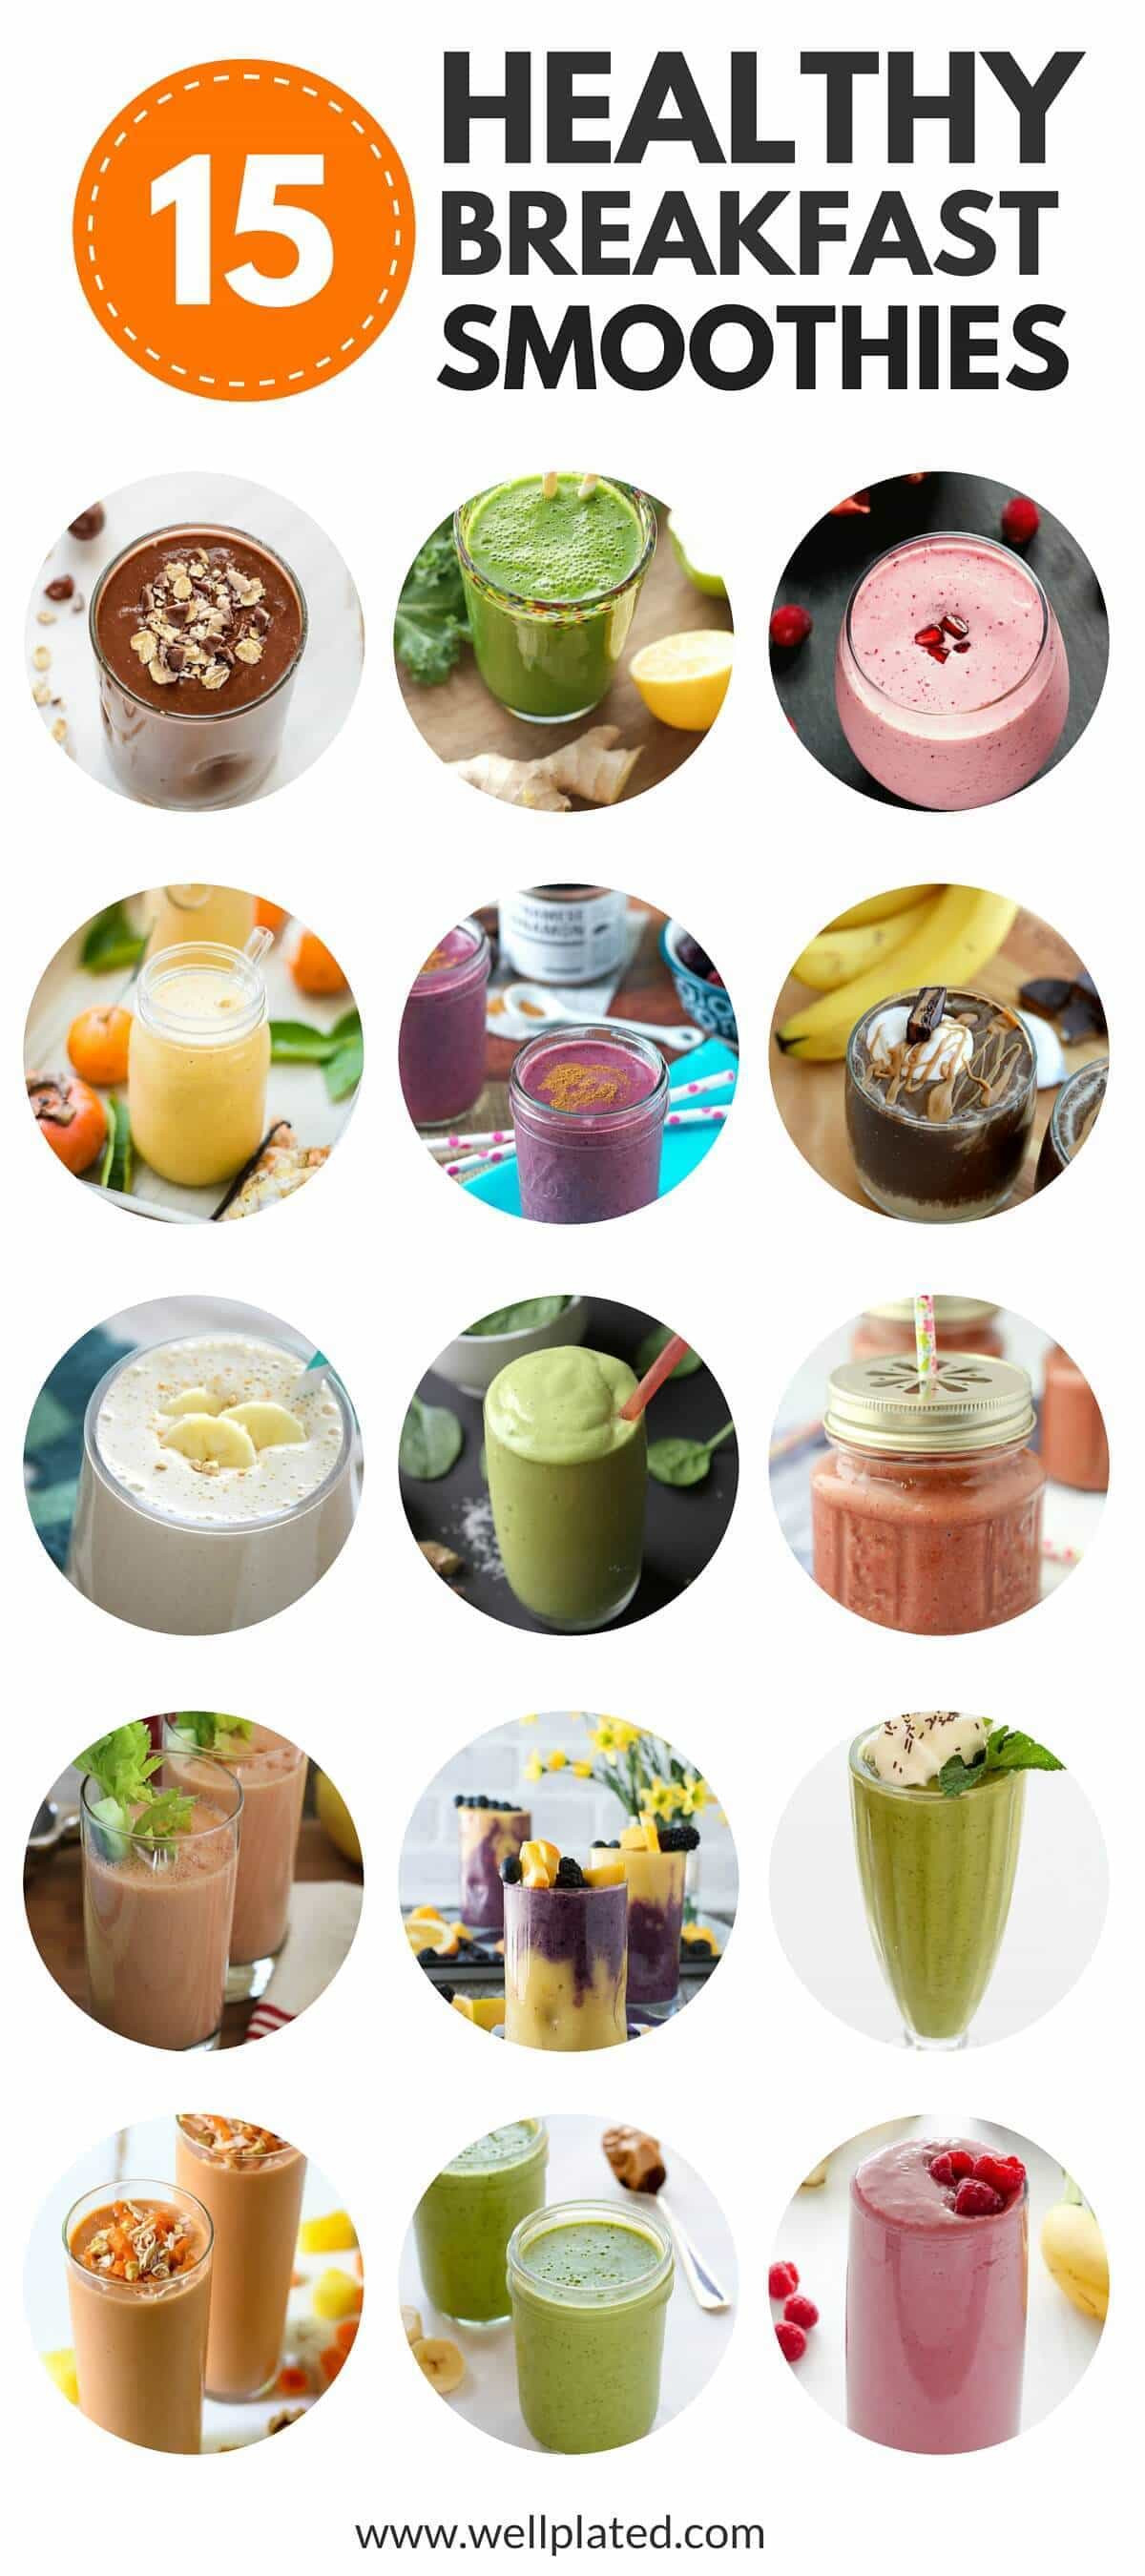 Healthy Breakfast Smoothie Recipe  The Best 15 Healthy Breakfast Smoothies